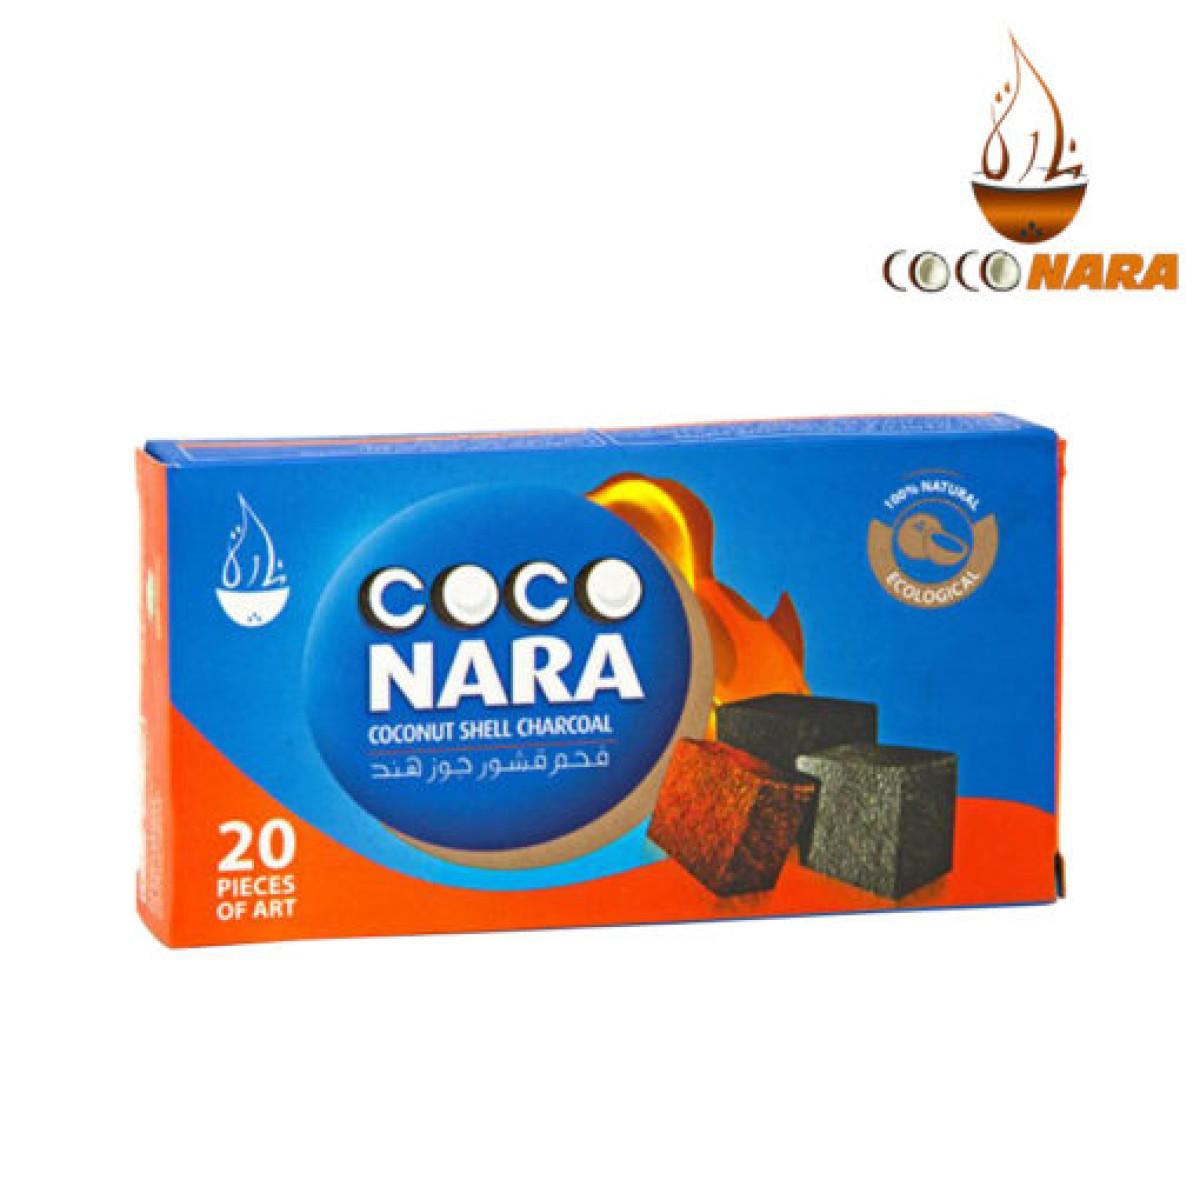 COCO NARA 26MM COCONUT CHARCOAL